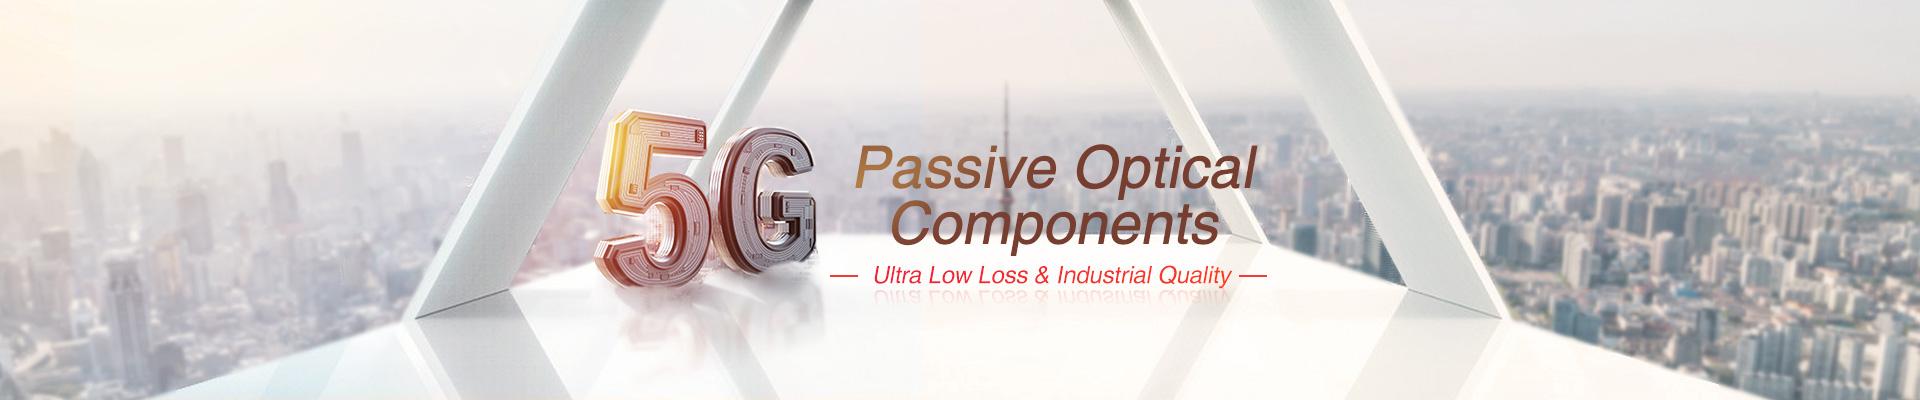 Componentes ópticos pasivos: pasivos WDM / CWDM / DWDM, CCWDM, AAWG, PLC Splitters, etc.